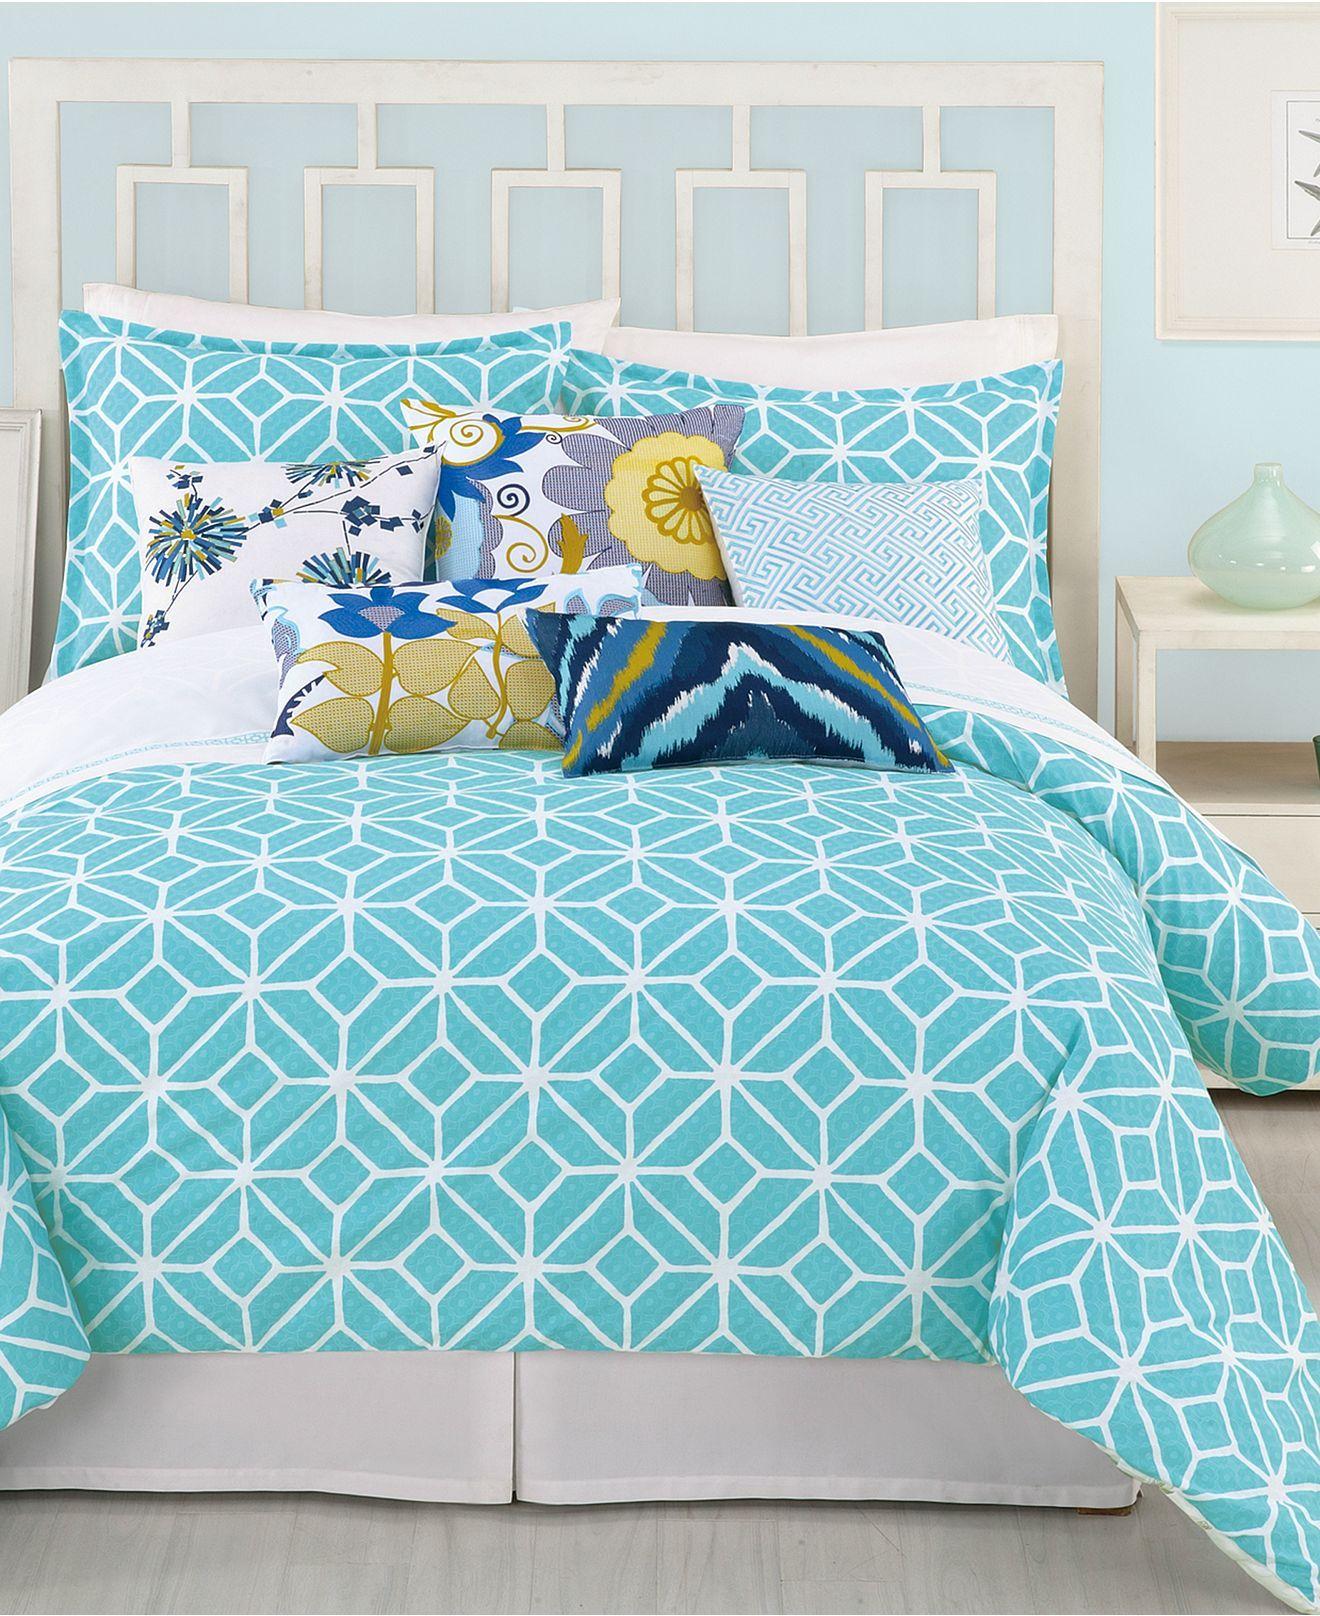 Trina Turk Bedding Trellis Turquoise Comforter And Duvet Cover